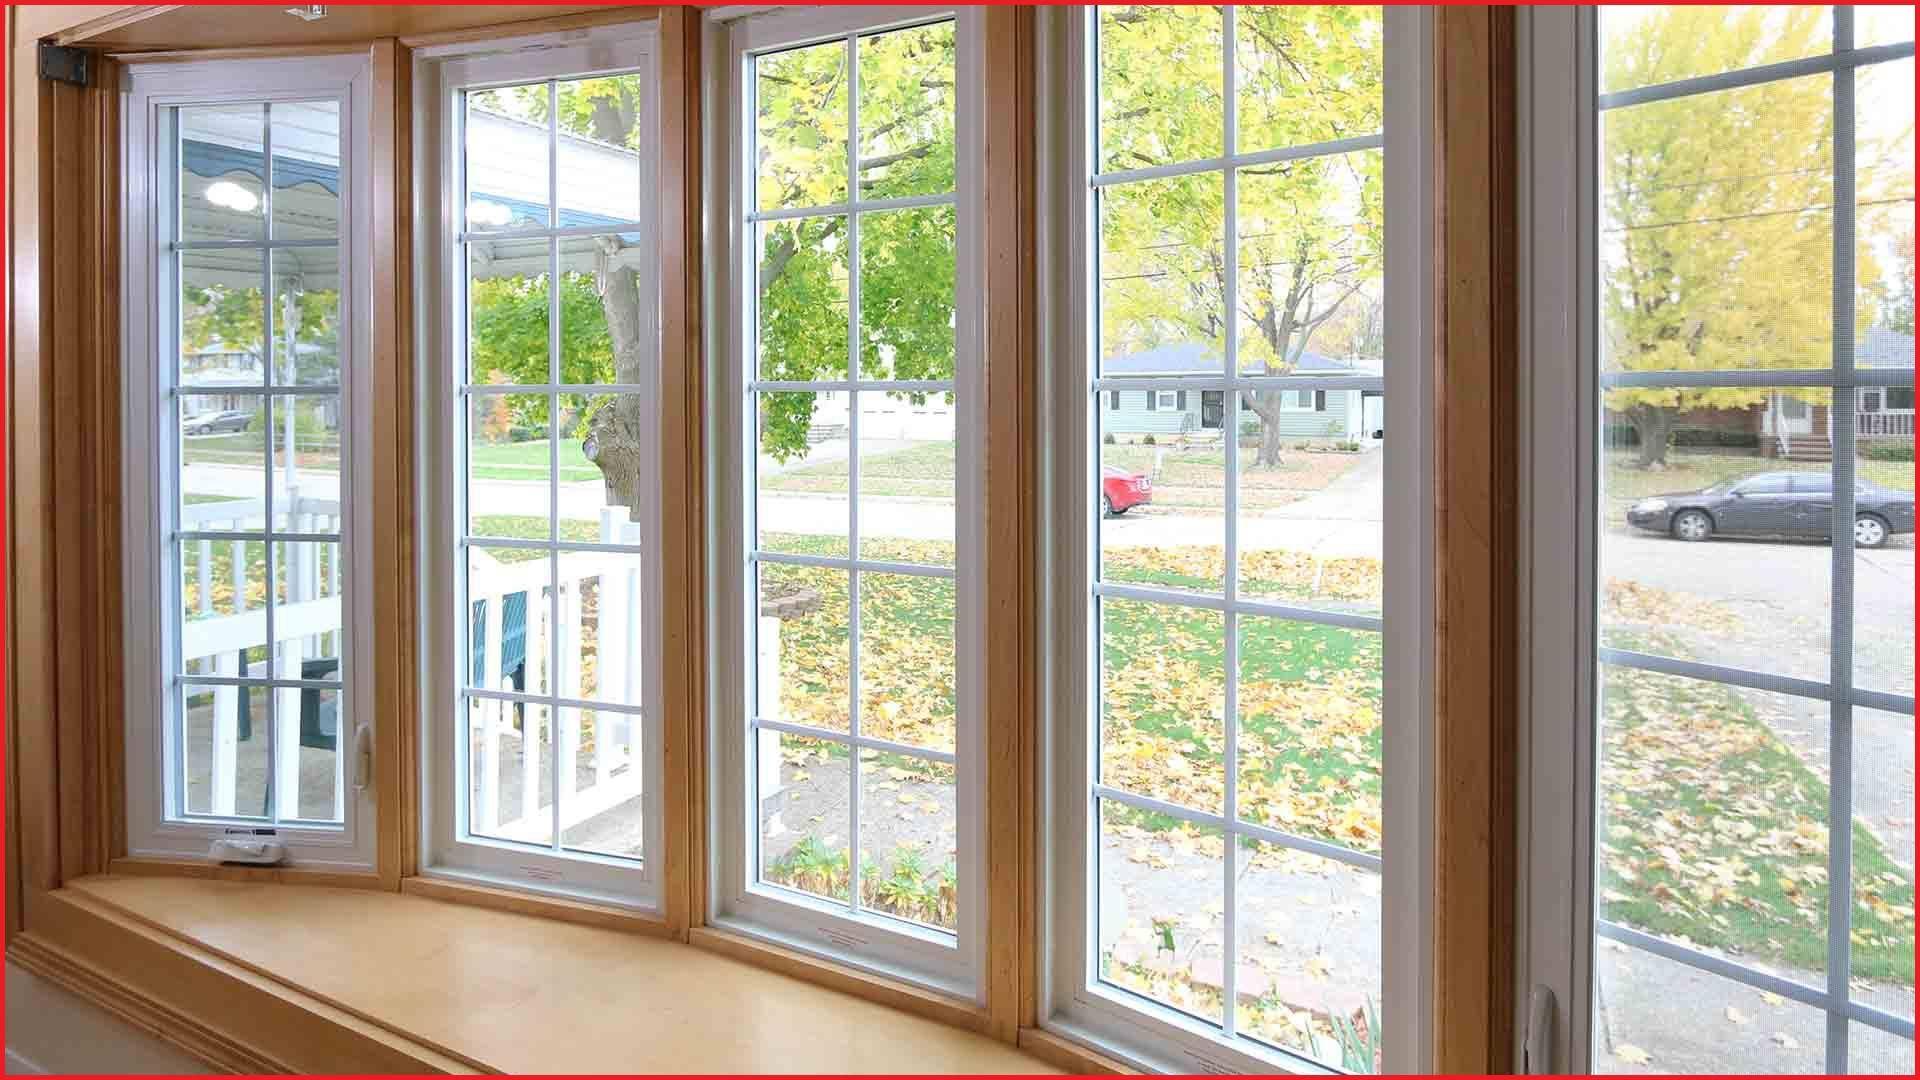 Replacement Windows Discount On Best Replacement Window Price Windows And Doors Window Prices Door Installation